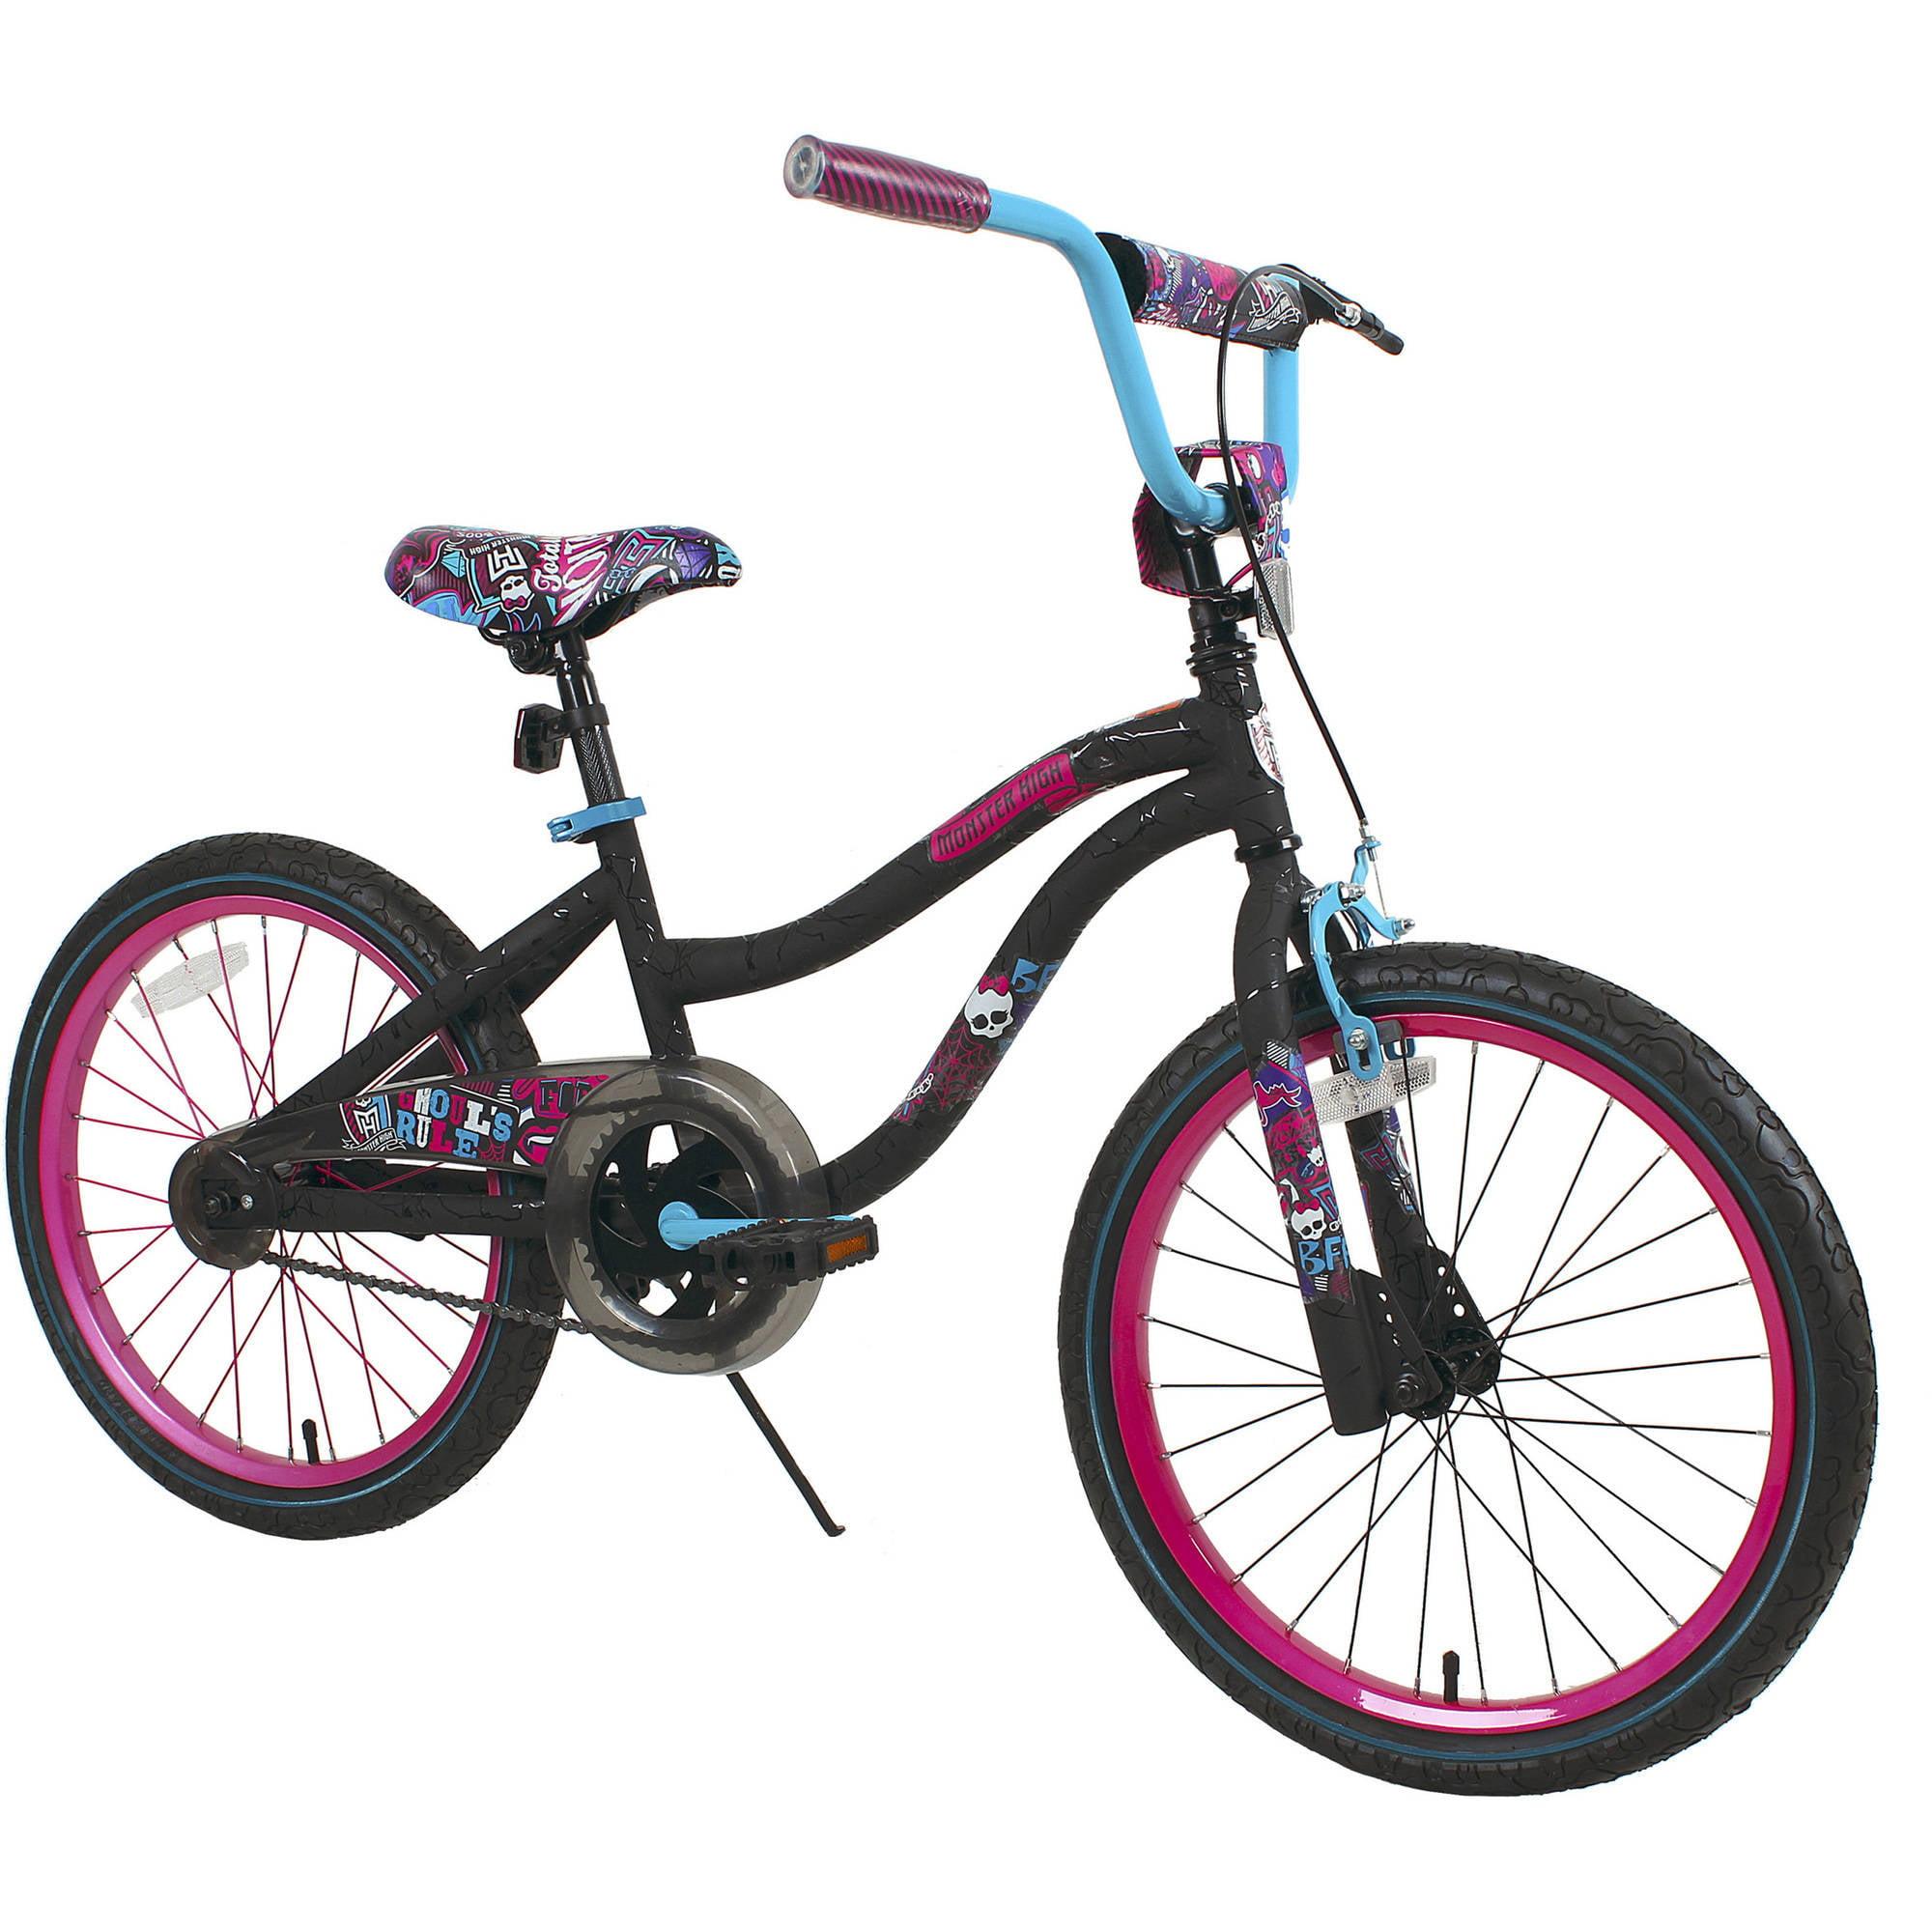 "20"" Monster High Girls' Bike by Dynacraft"